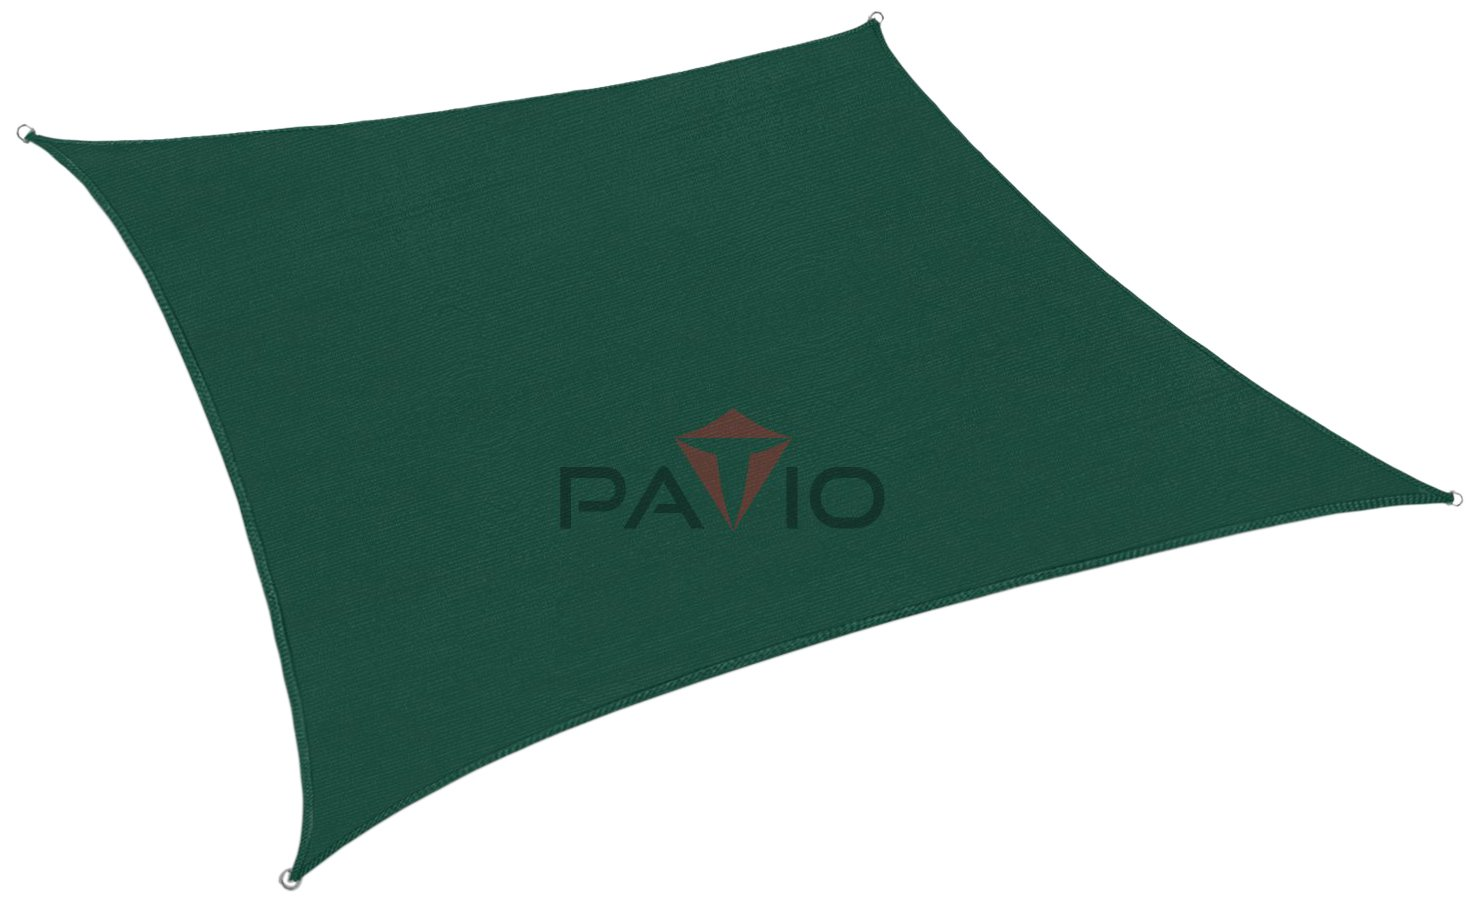 Patio Paradise 12 x12 Dark Green Sun Shade Sail Square Canopy – Permeable UV Block Fabric Durable Patio Outdoor